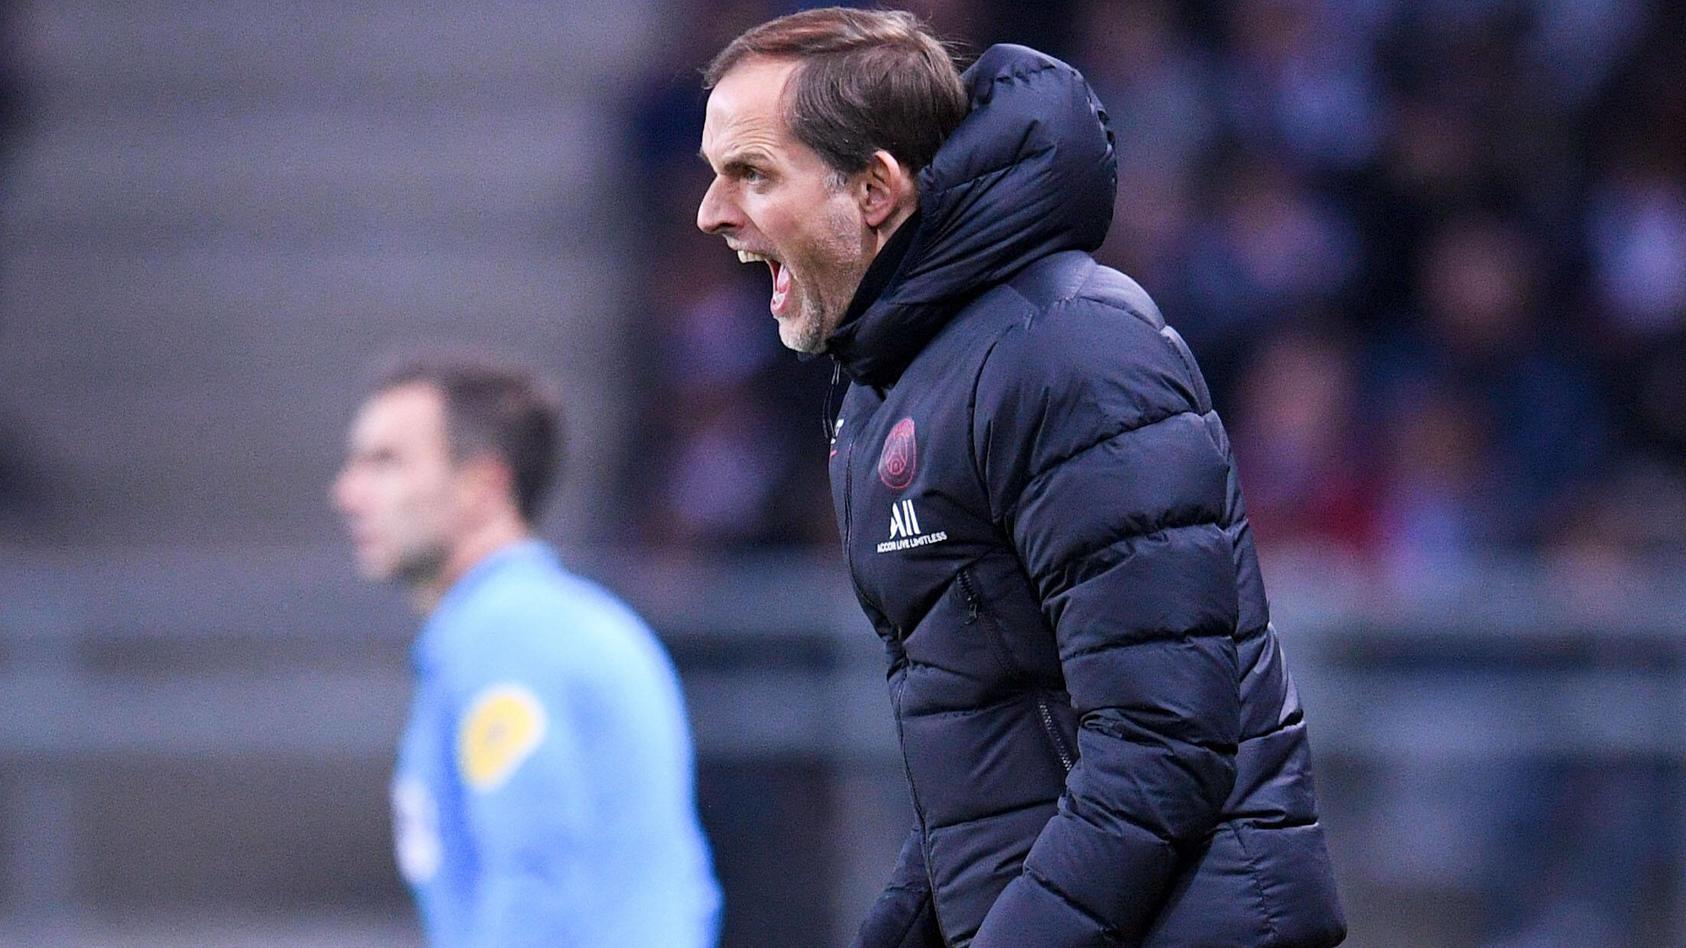 THOMAS TUCHEL (ENTRAINEUR PSG) FOOTBALL : Amiens vs Paris SG - Ligue 1 Conforama - 15/02/2020 FEP/Panoramic PUBLICATIONx